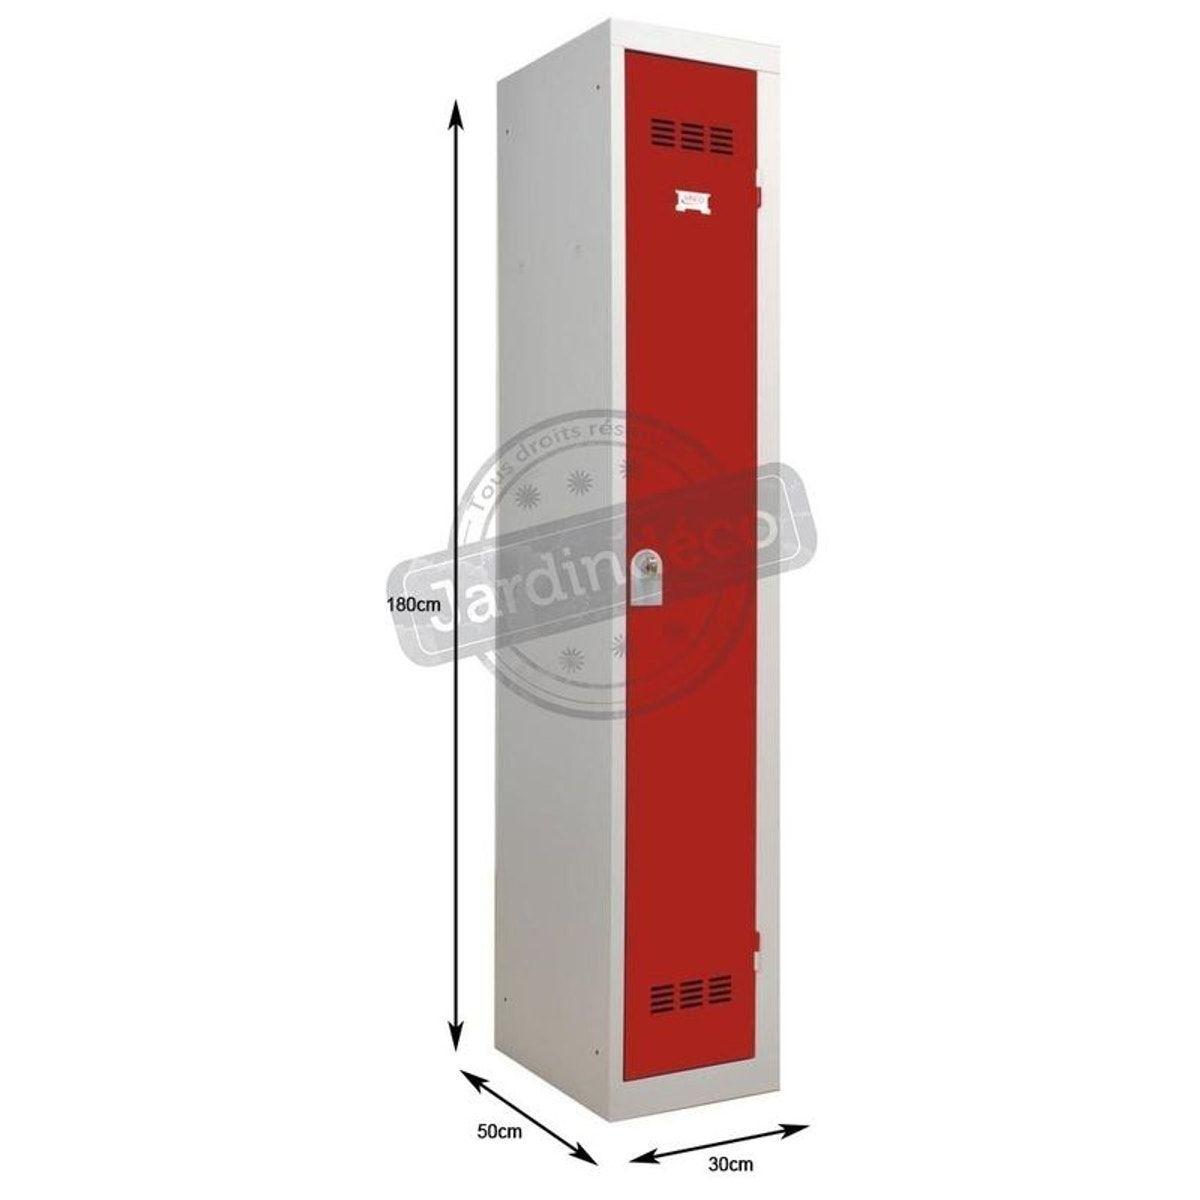 Vestiaire Industriel Metal 1 Porte Armoire De Toilette Vestiaire Metallique Et Vestiaire Industriel